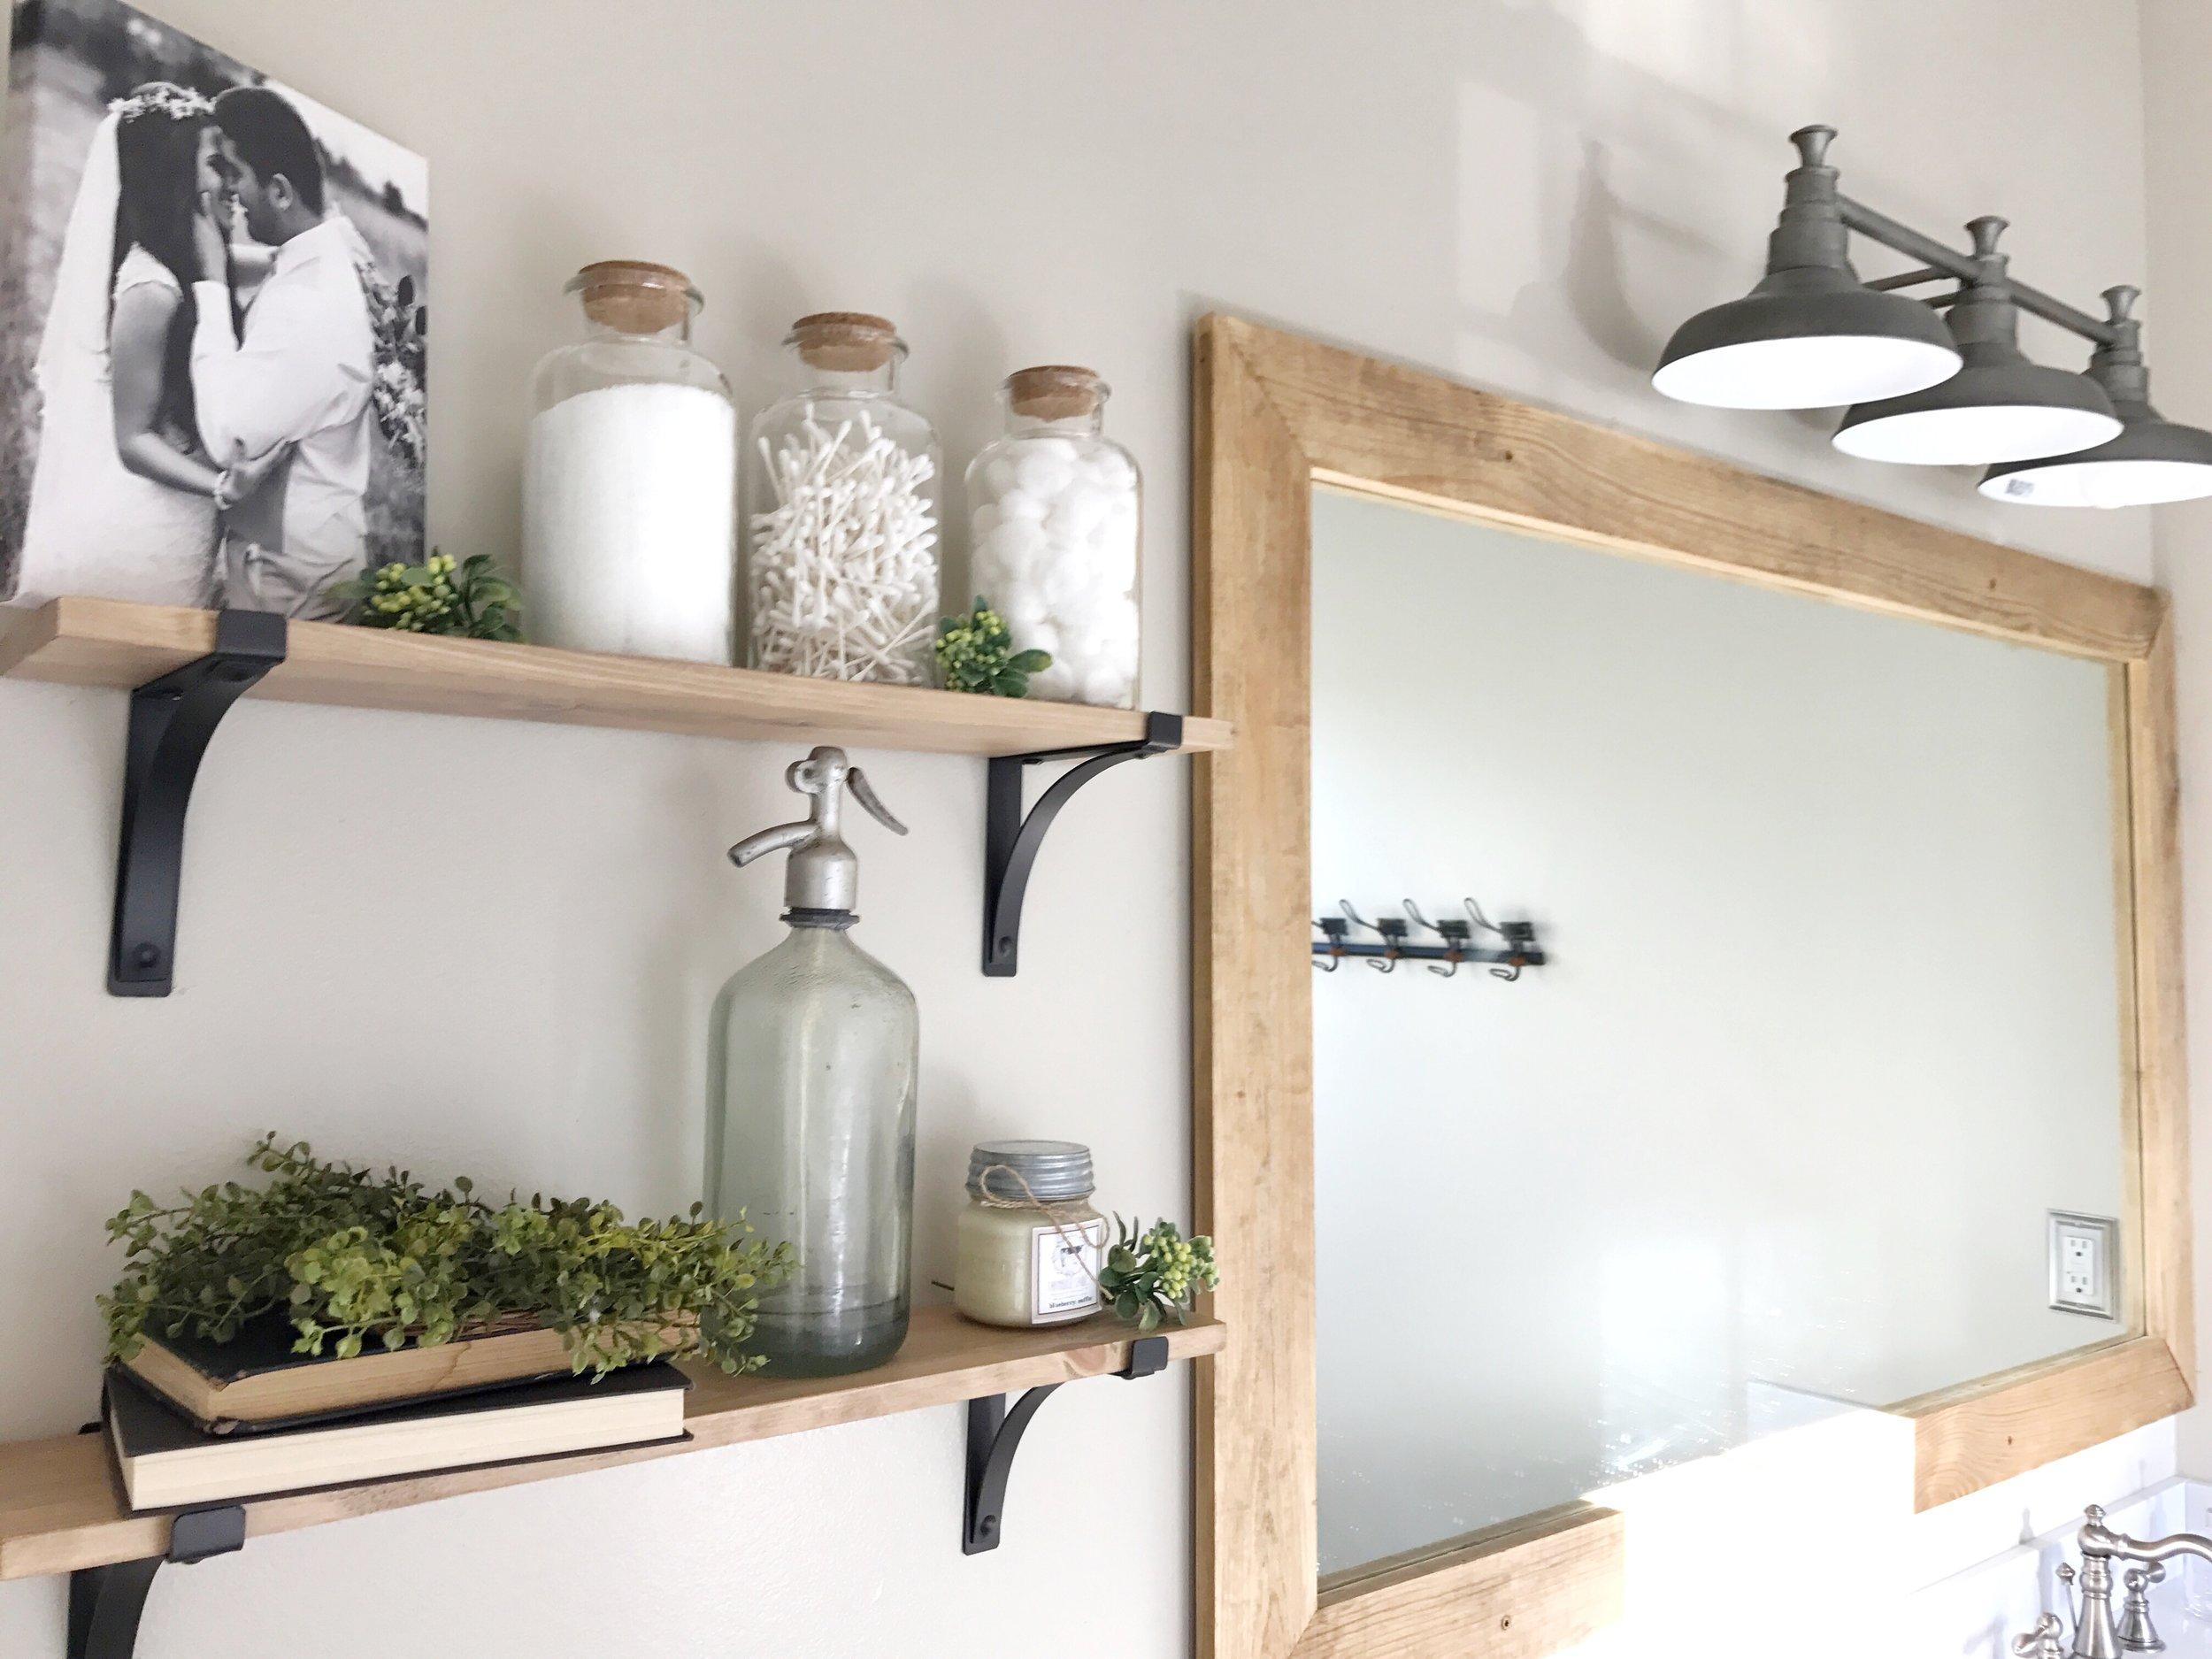 The Simple Abode Interior Design Project- Farmhouse Style Bathroom- By Plum Pretty Decor and Design